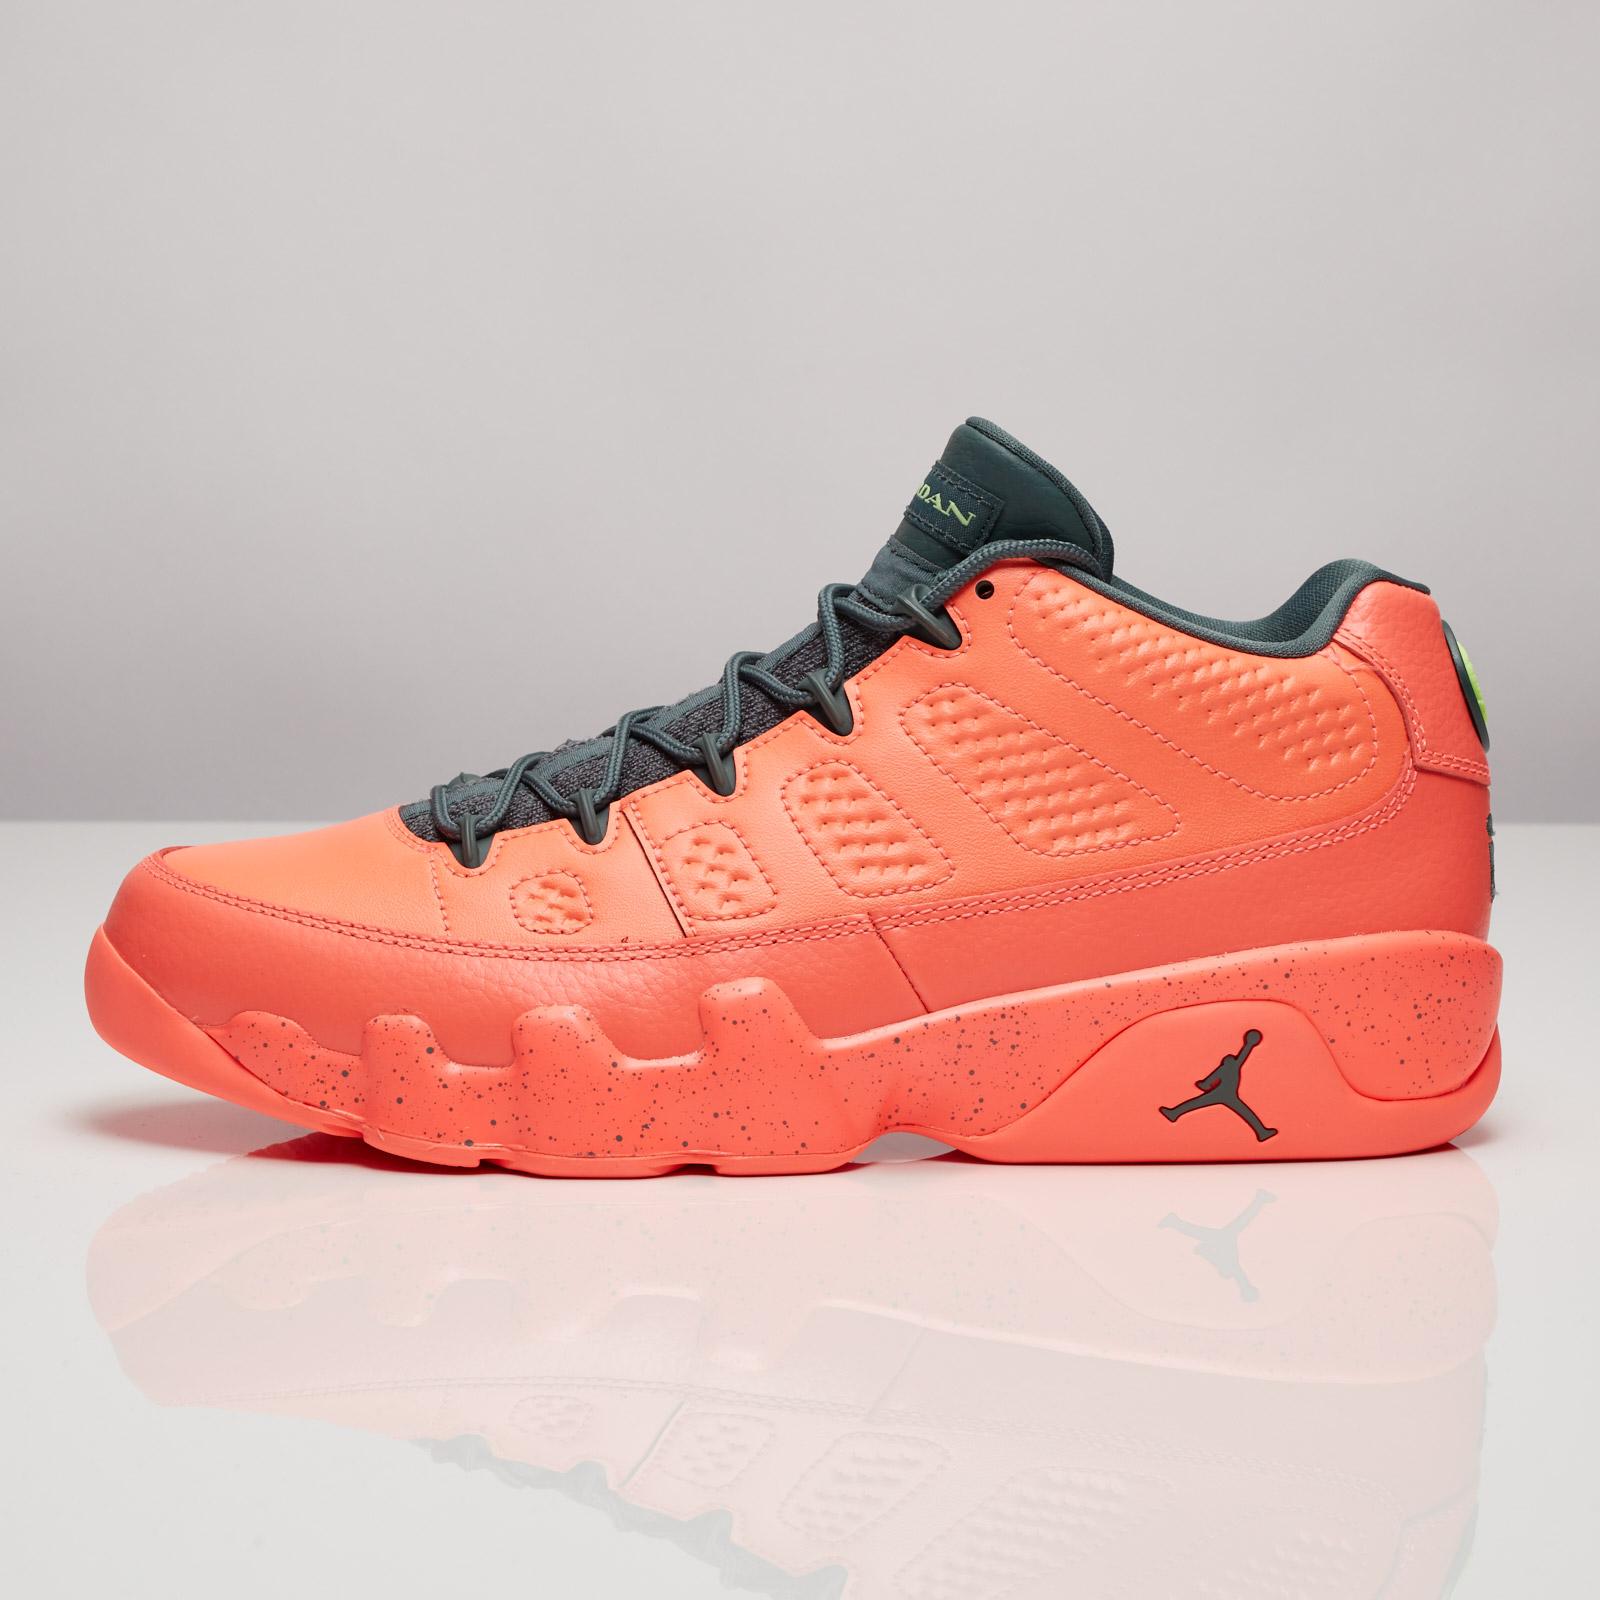 16462ed3897 Jordan Brand Air Jordan 9 Retro Low - 832822-805 - Sneakersnstuff    sneakers & streetwear online since 1999